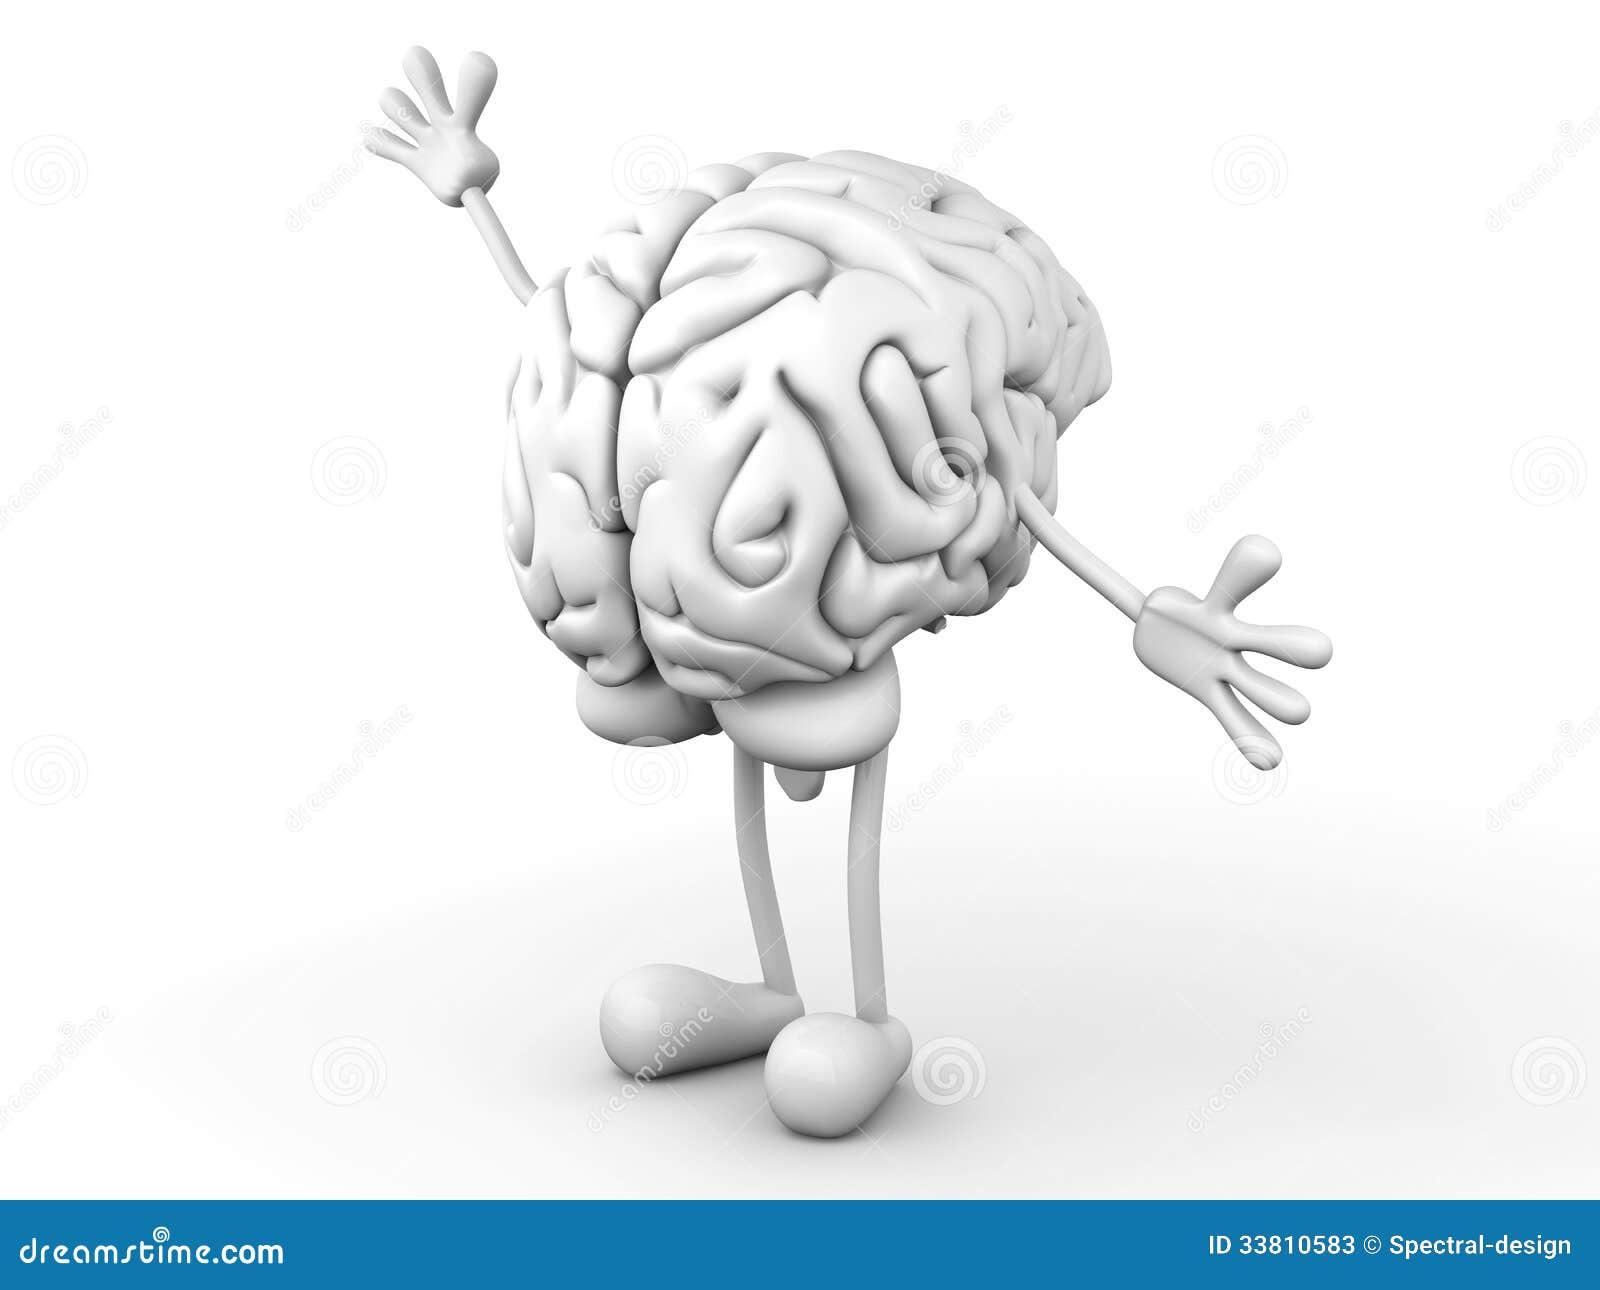 Karikatur-Gehirn stock abbildung. Illustration von gehirn - 33810583